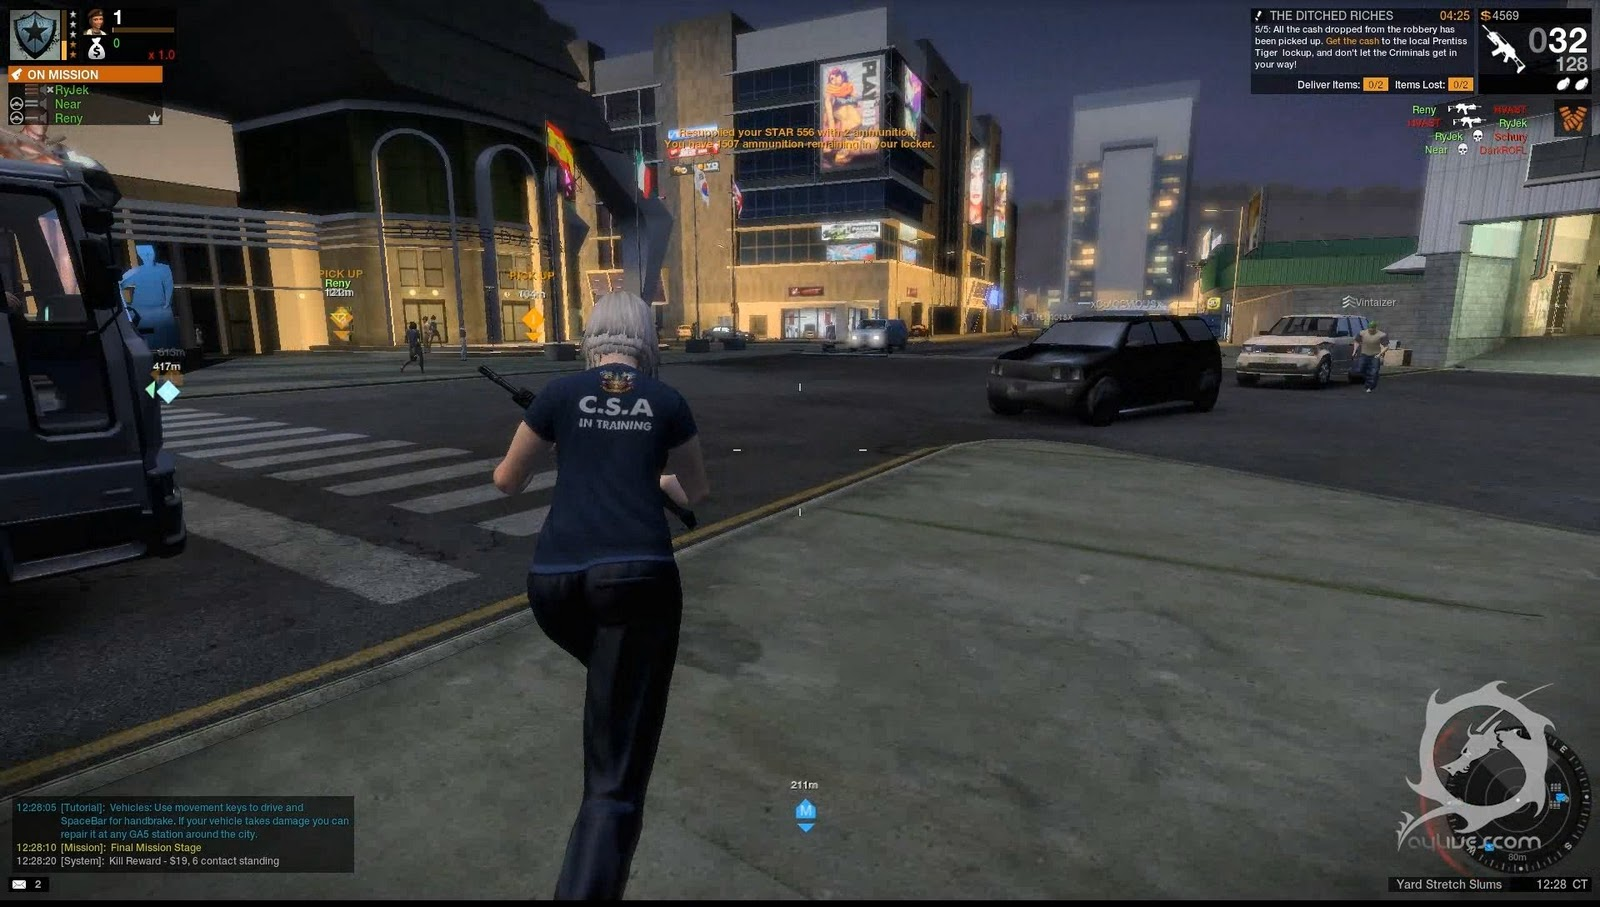 Play Game Gta 5 Online